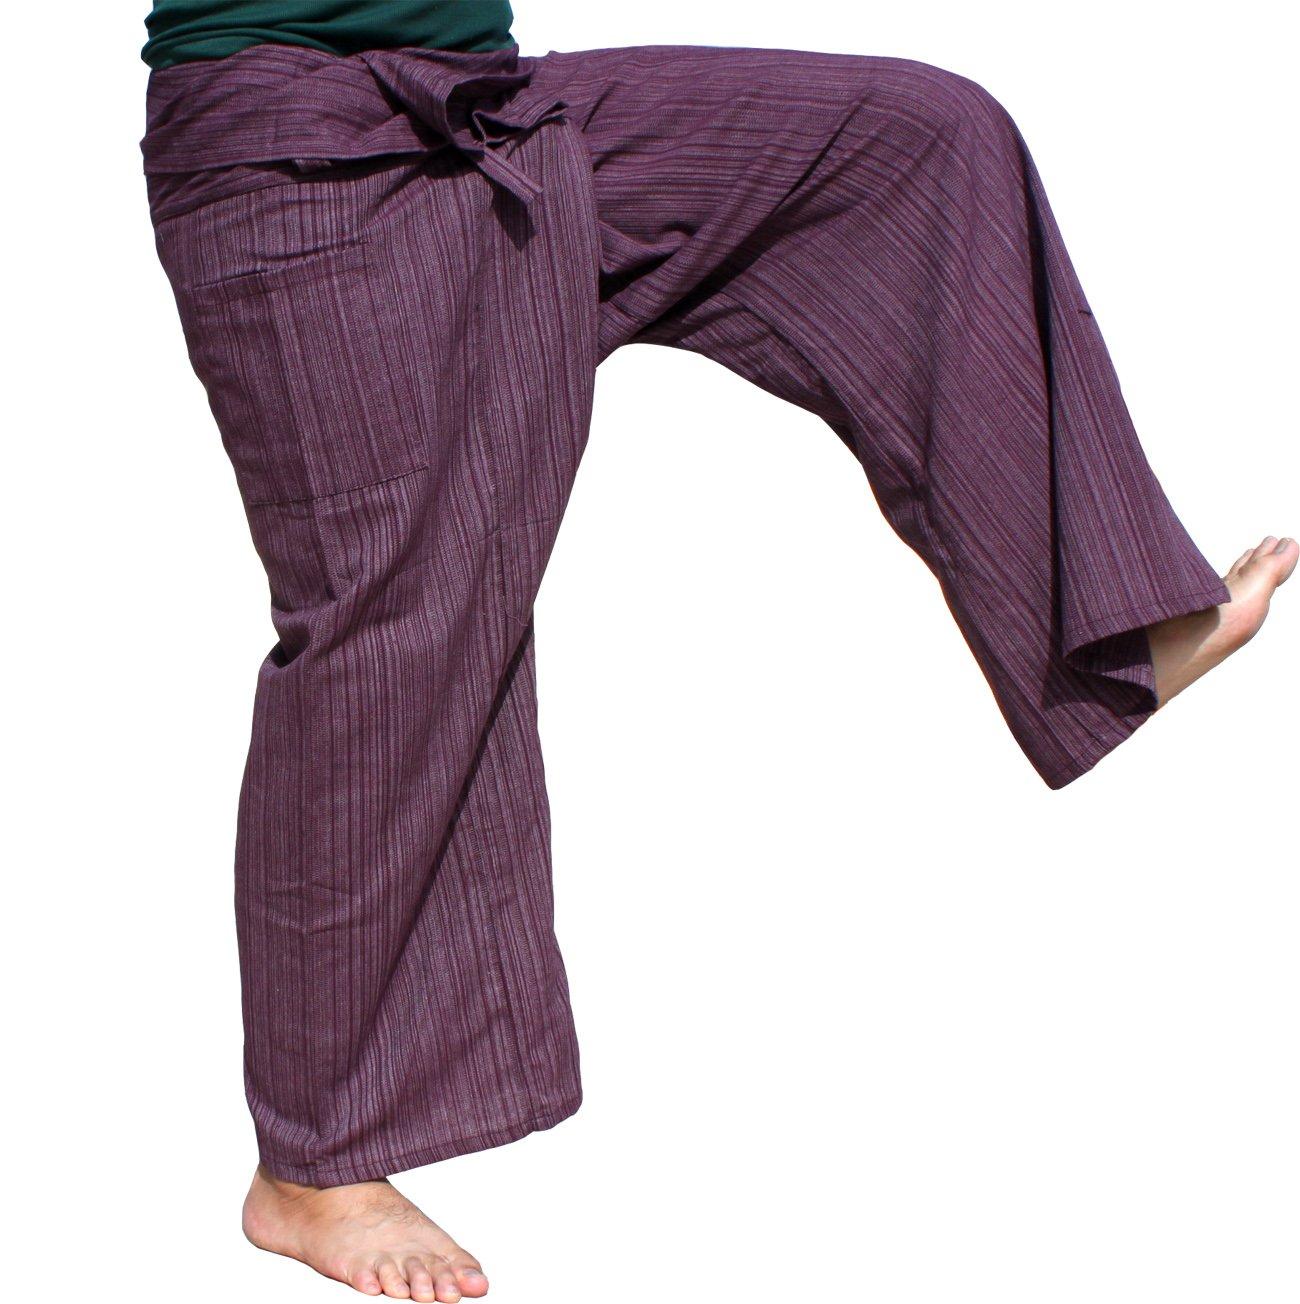 RaanPahMuang Light Striped Cotton Tall Thai Fisherman Wrap Pants Plus, XX-Large, Warm Purple by RaanPahMuang